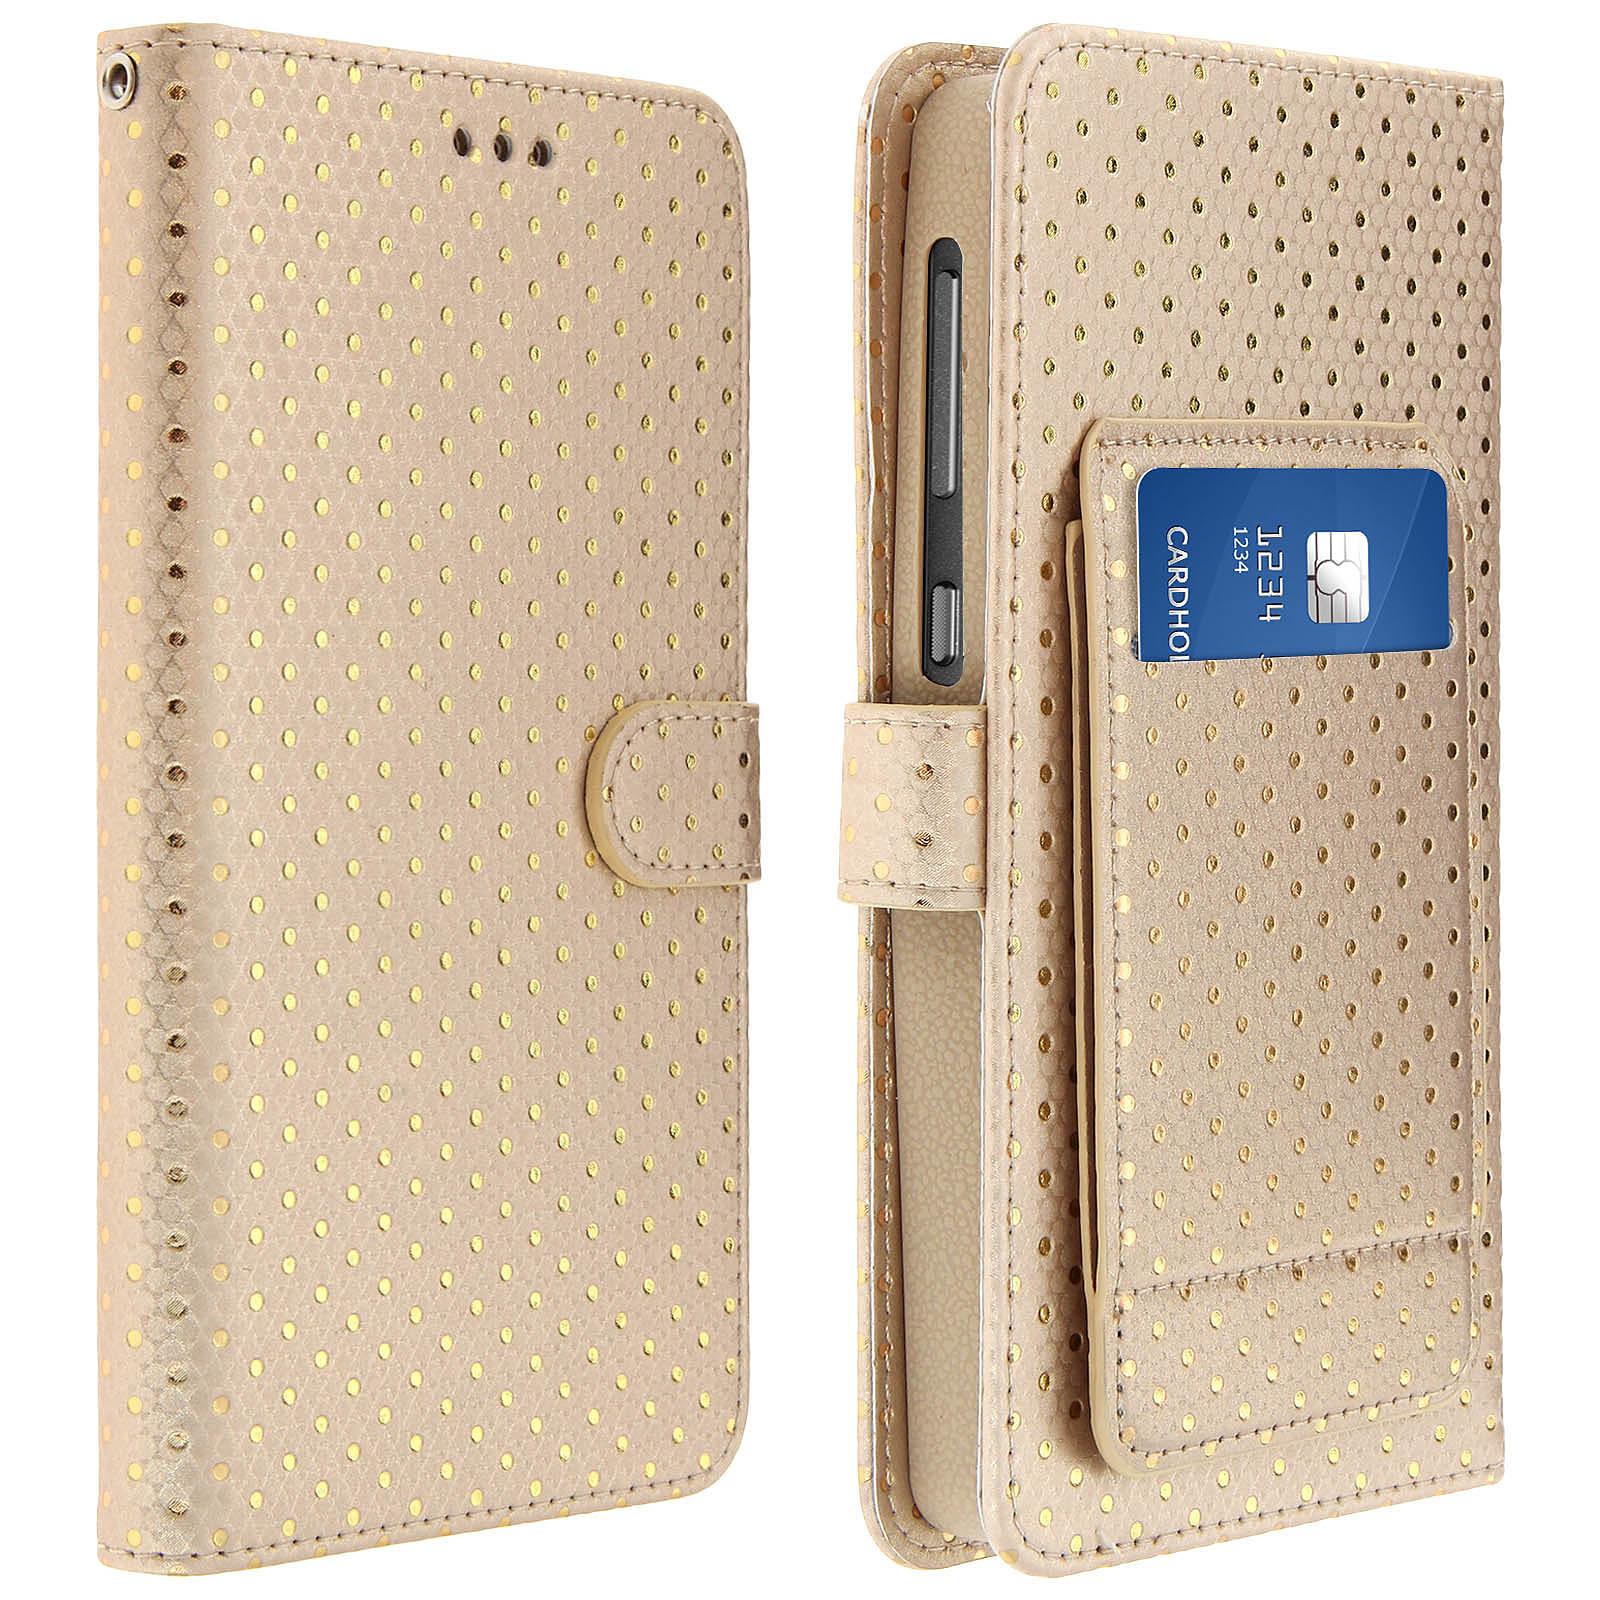 Avizar Etui folio Dorée pour Smartphones de 4.3' à 4.7'